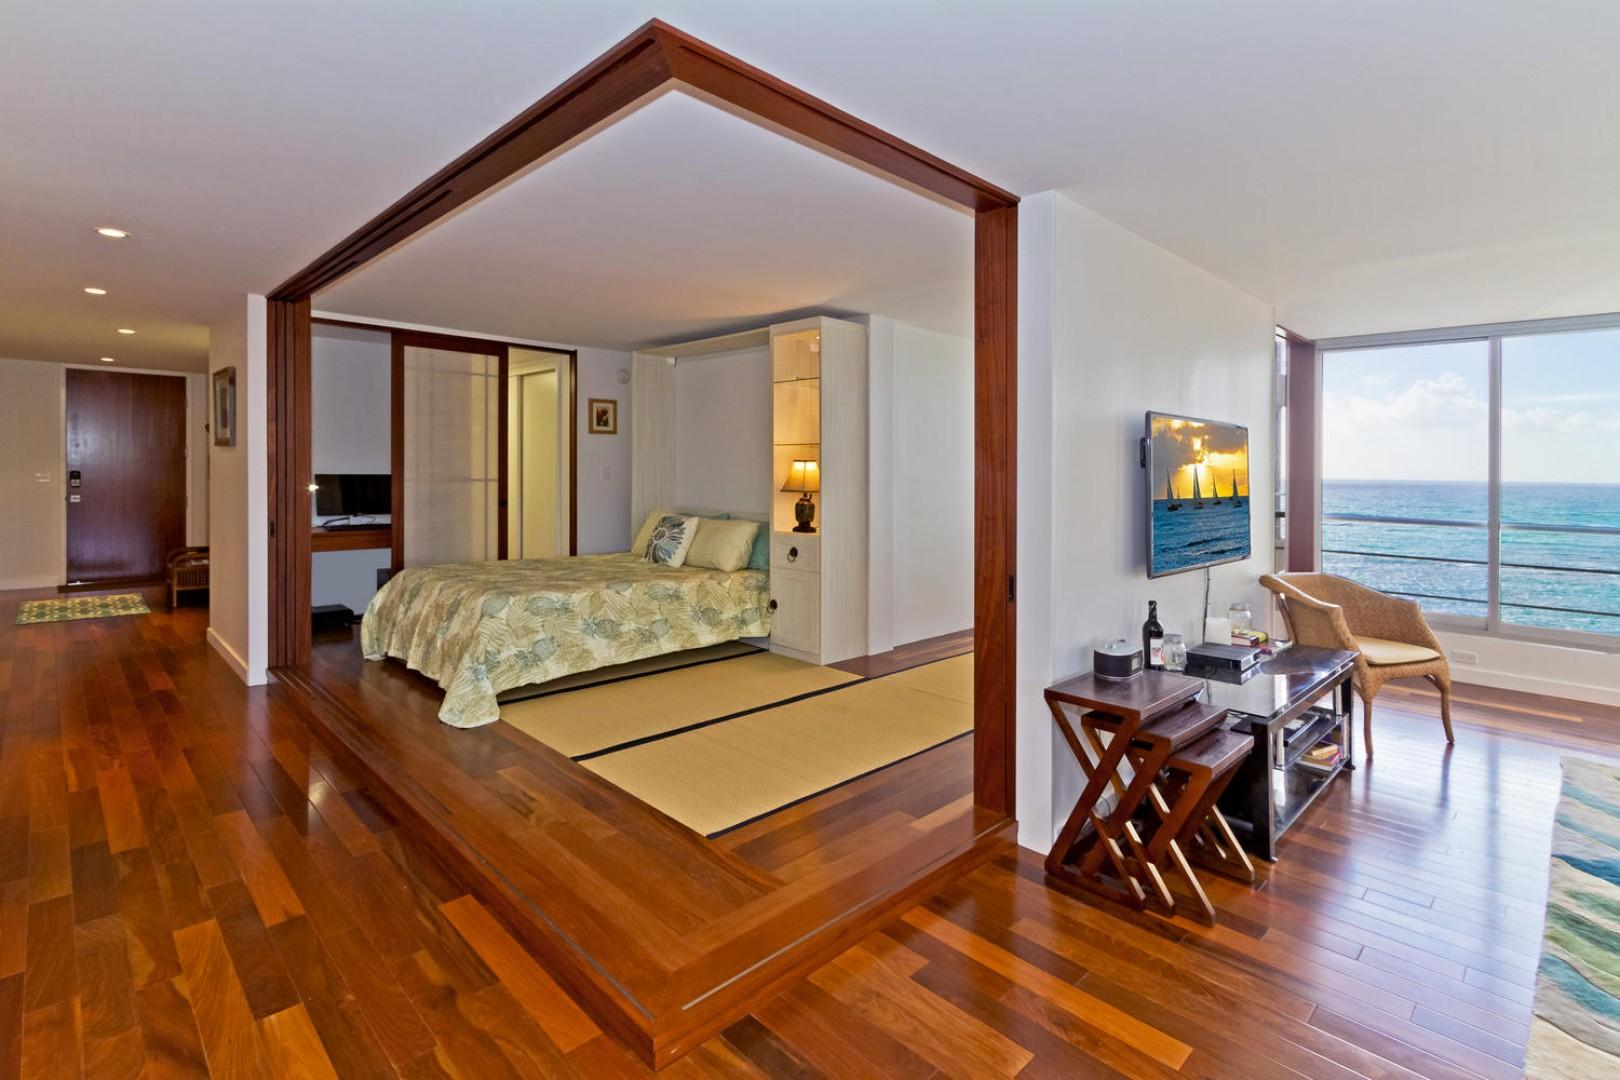 Guest bedroom with queen-size Murphy bed.